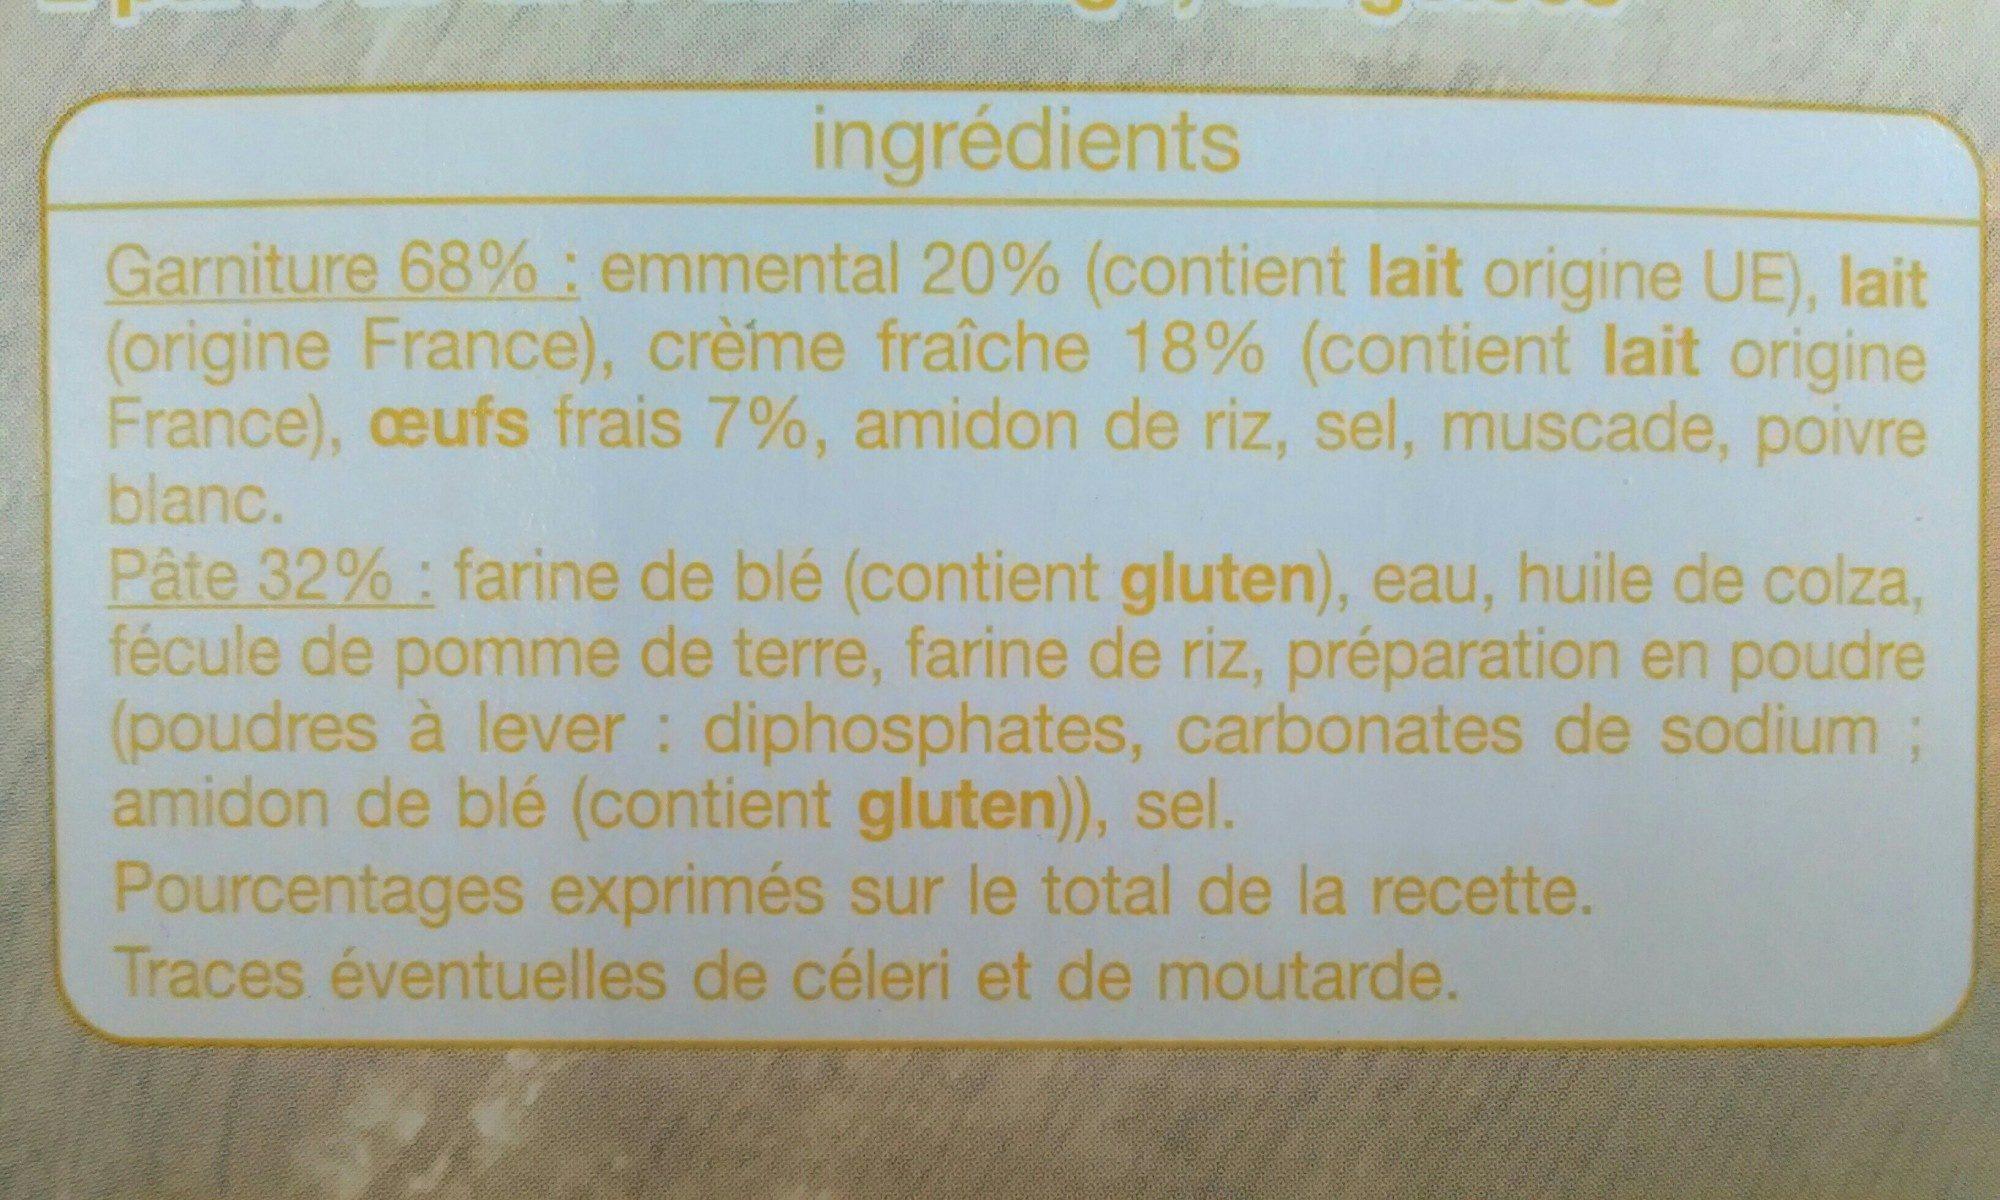 Tarte au fromage - Ingredients